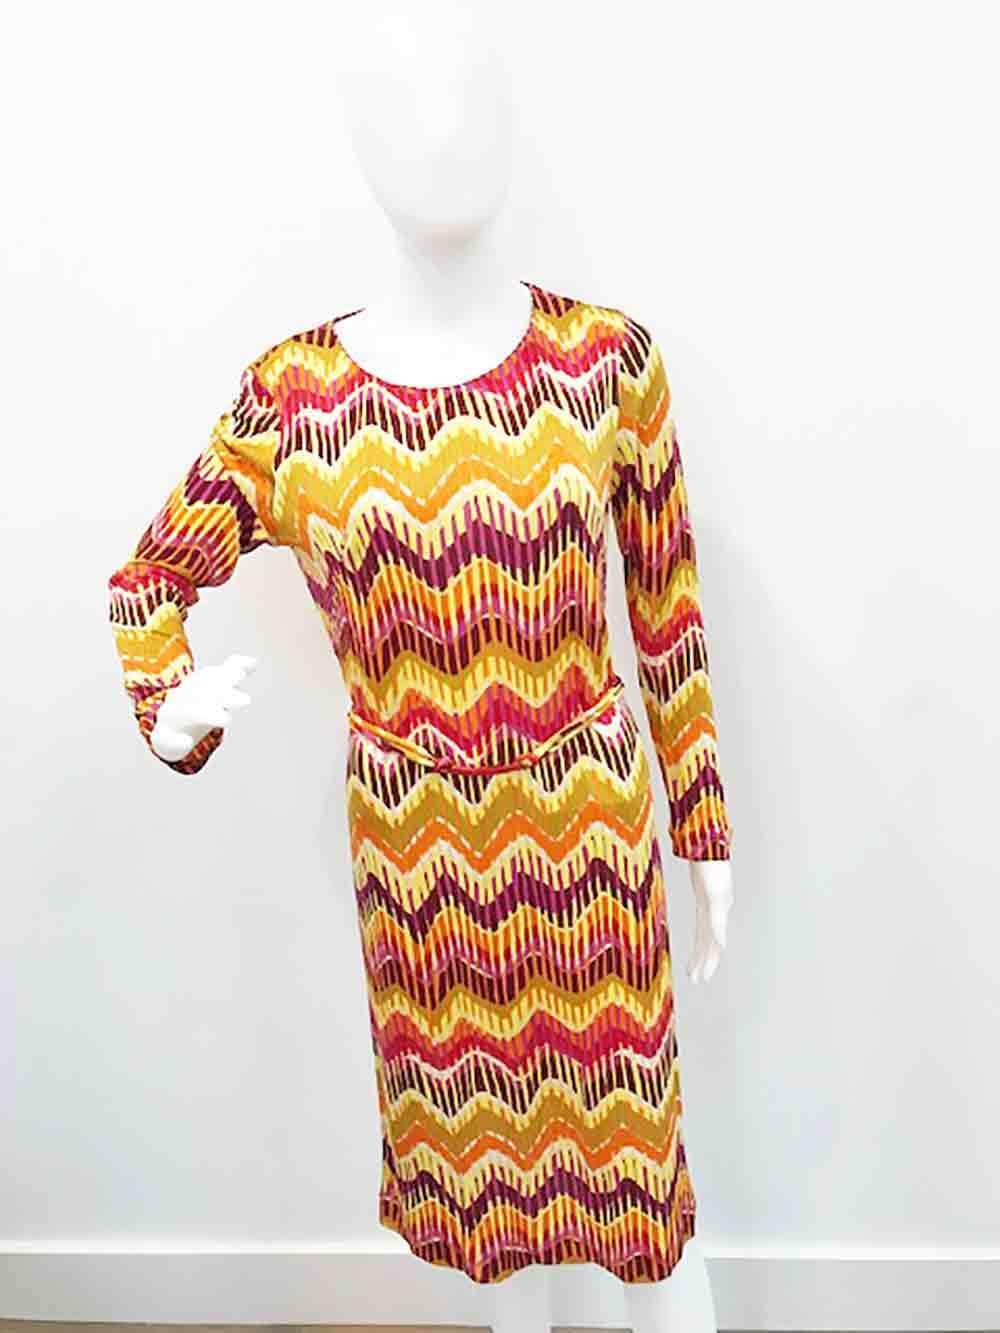 779e4b0d57a18 ... Designer Missoni VTG Stunning Stretch Silk Size 10 to 12 12 12 AU  Women's Dress 30b3aa ...